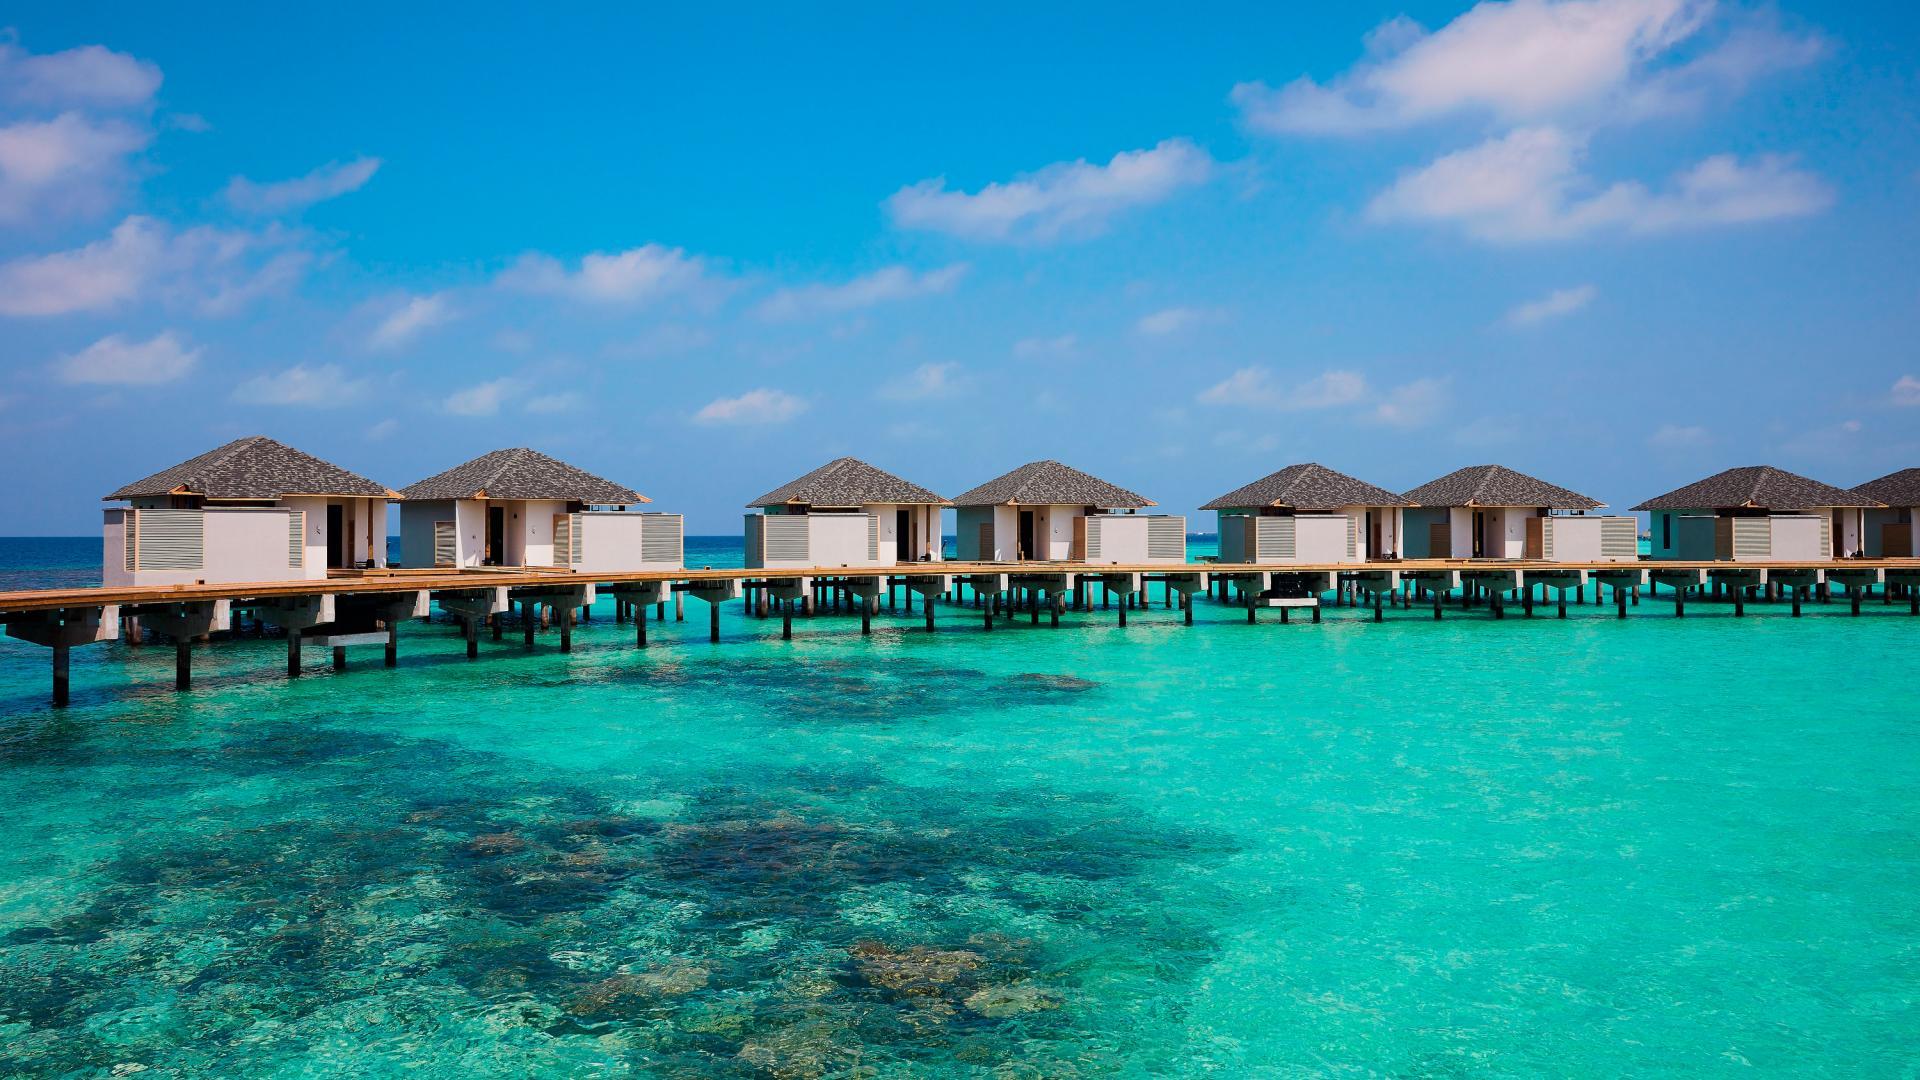 туры на Мальдивы из Алматы